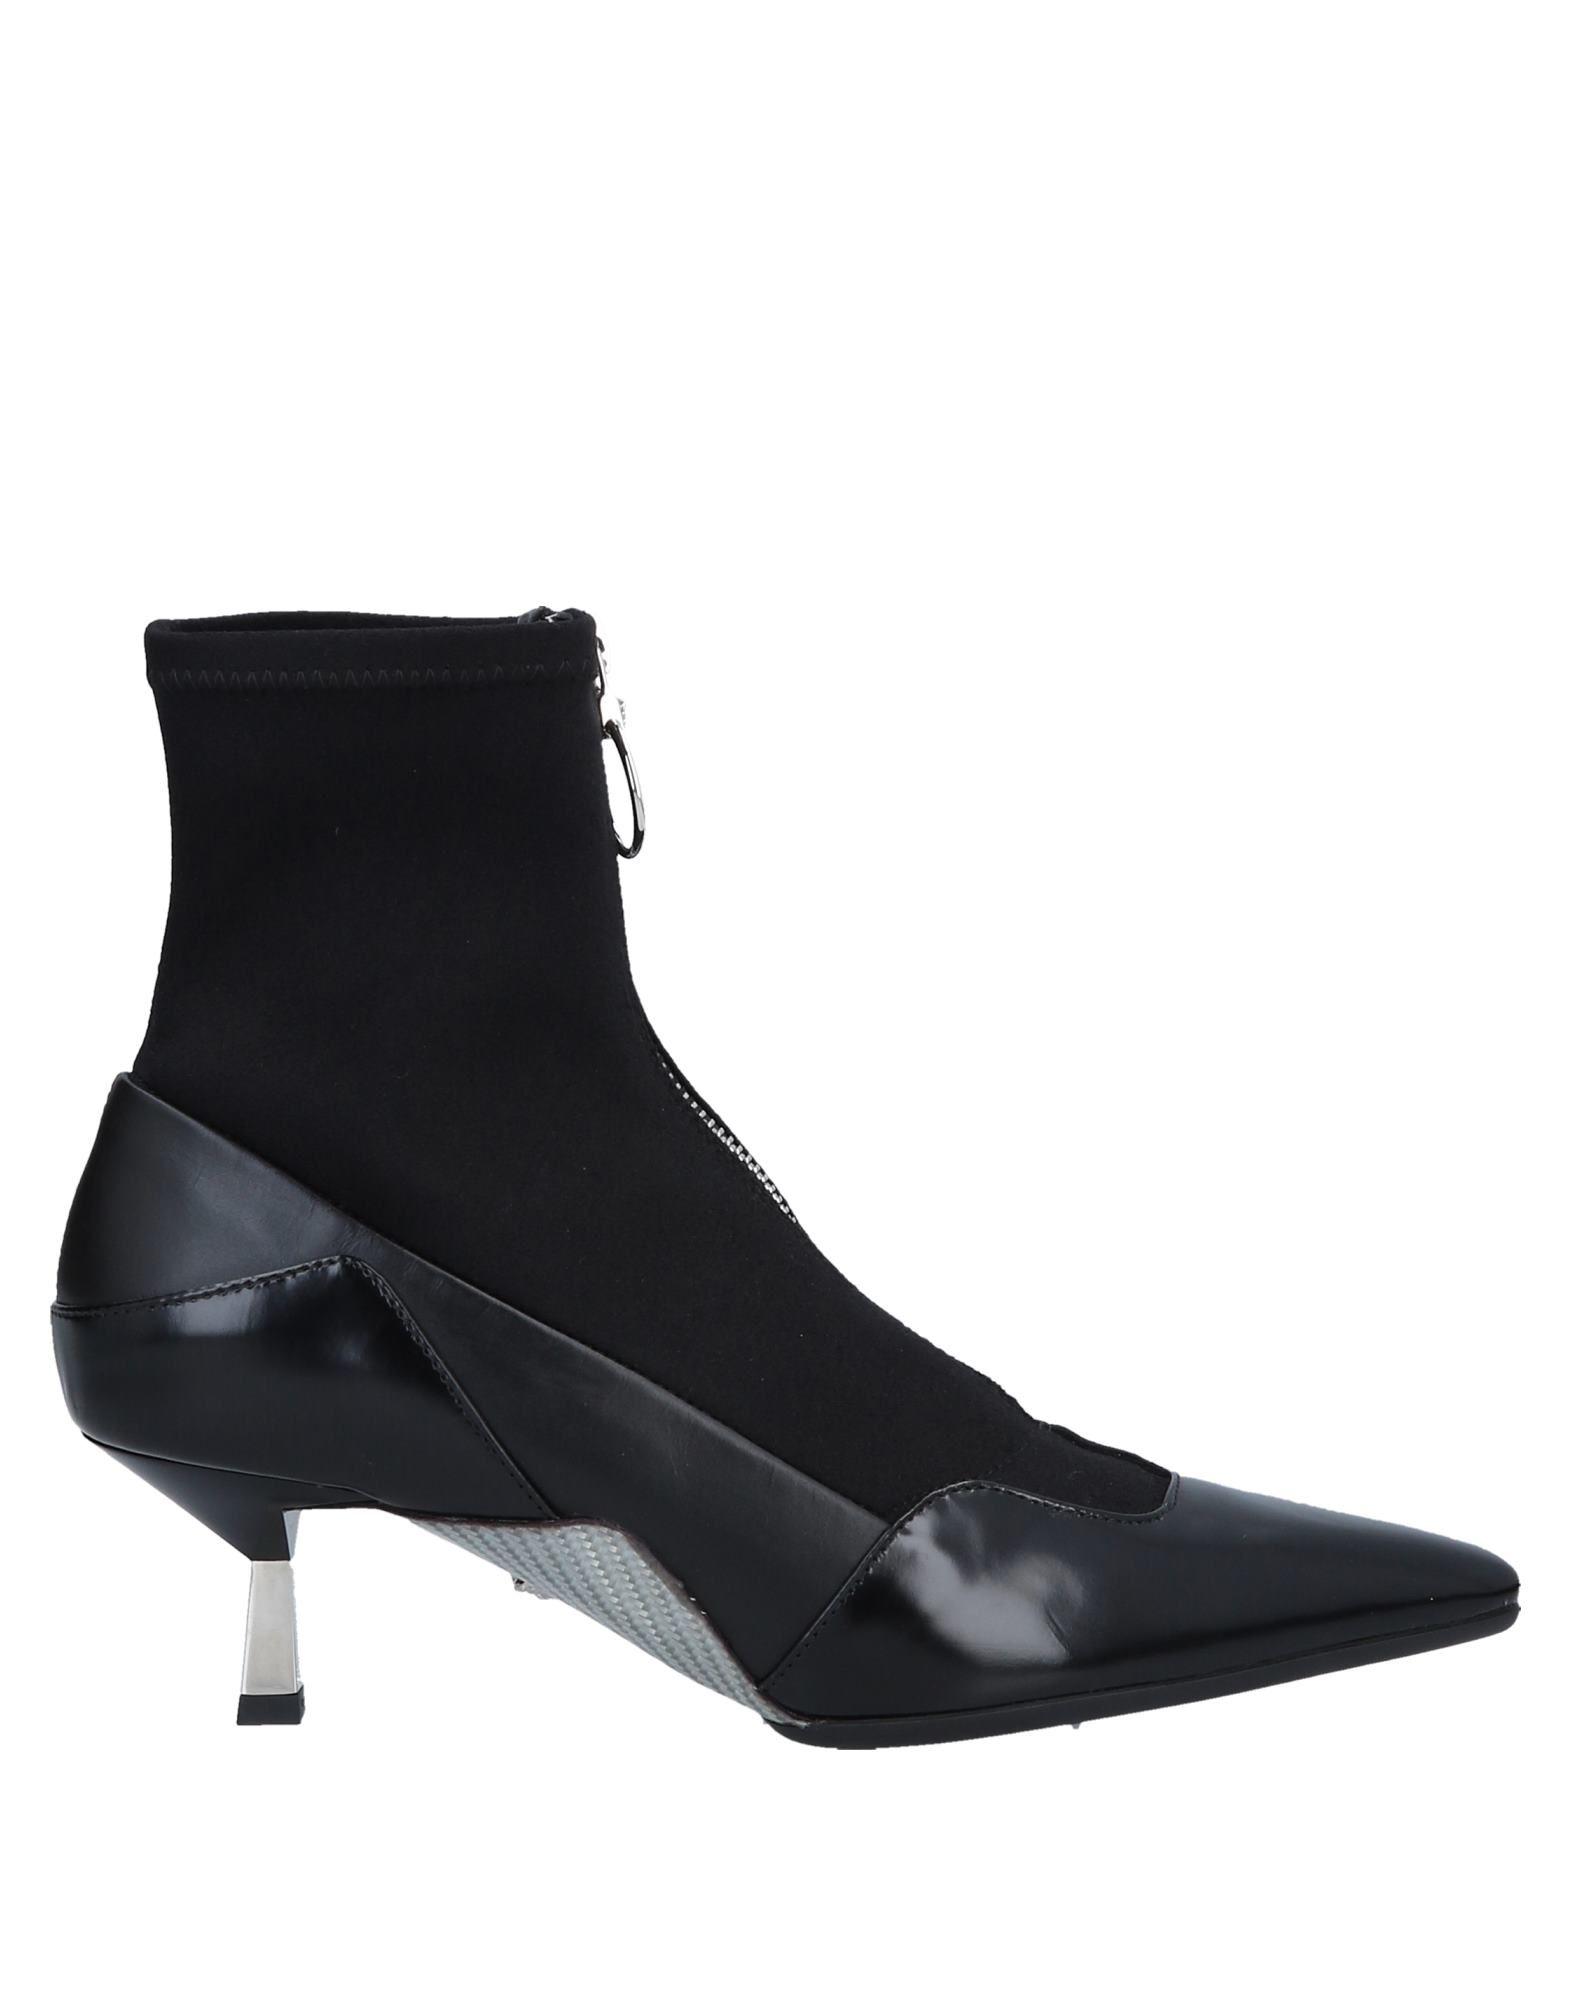 Versace Ankle Boot - Women Versace  Ankle Boots online on  Versace Australia - 11565142VP 0cc932